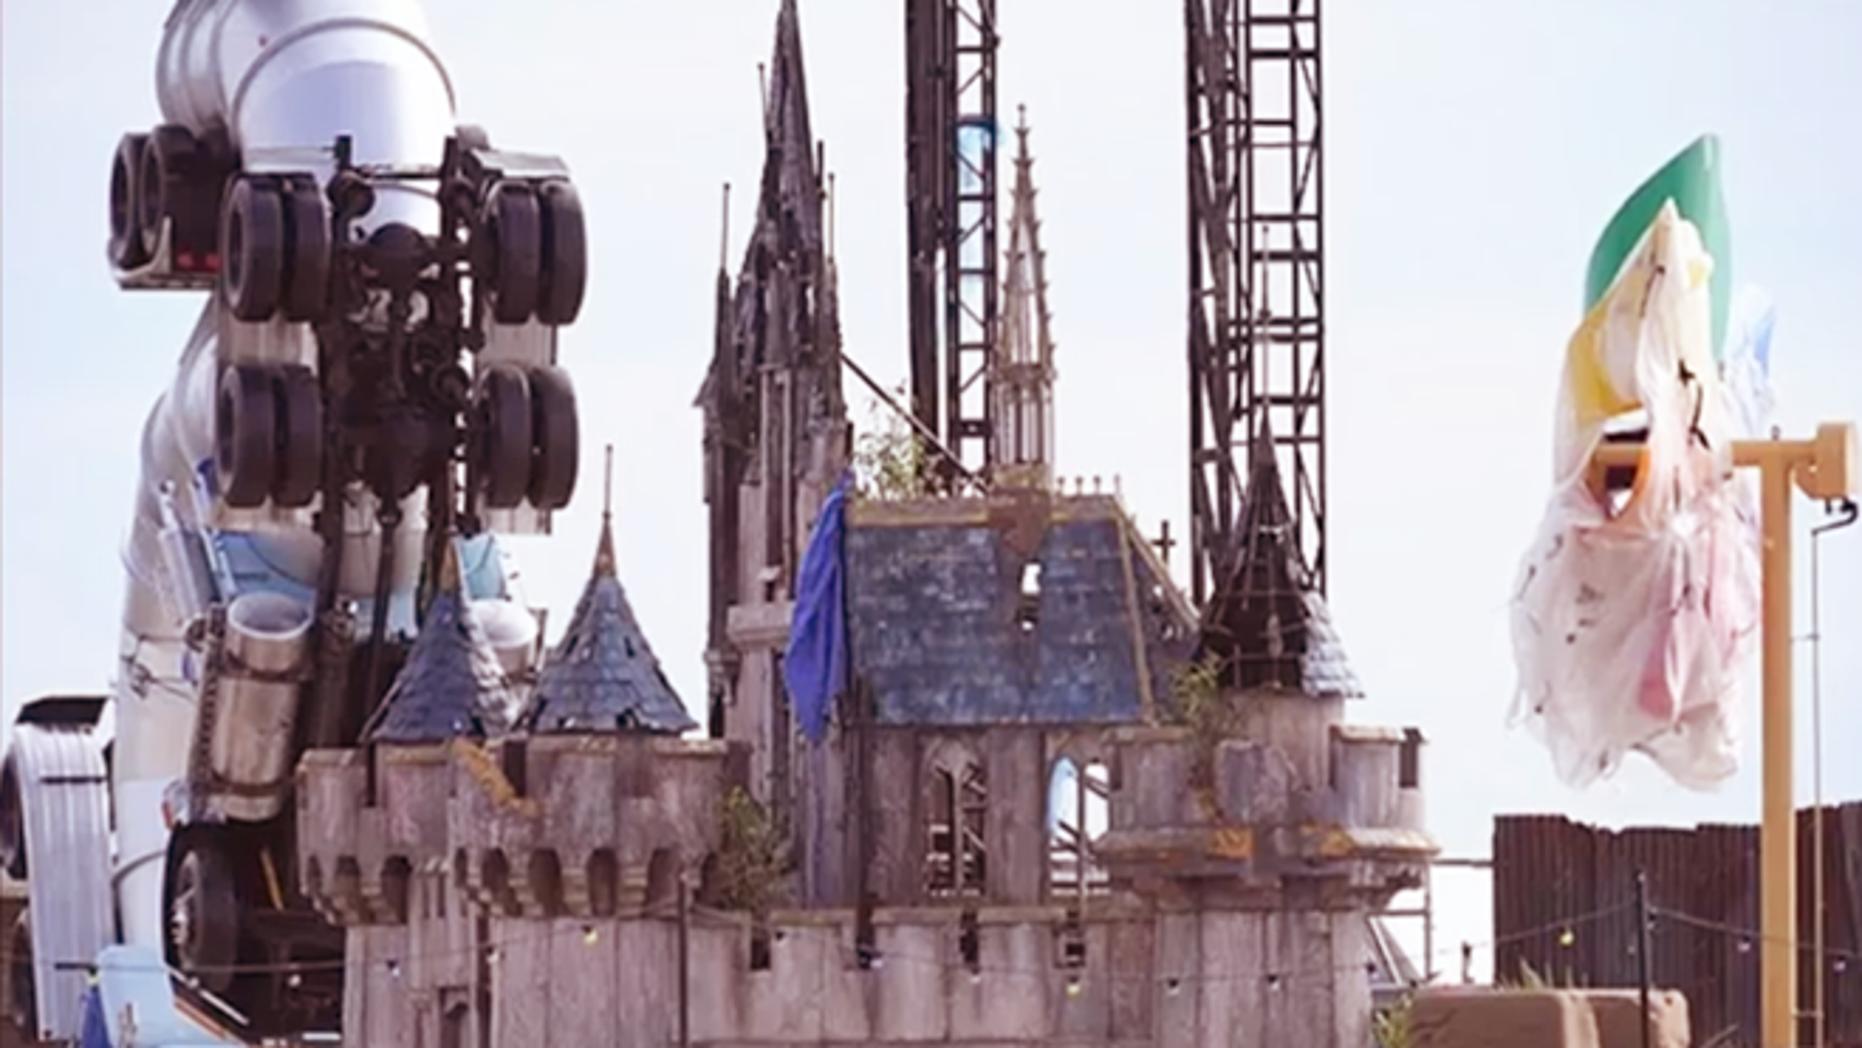 A peek inside Dismaland, rumored to be Banksy's dismal take on a Disney theme park.